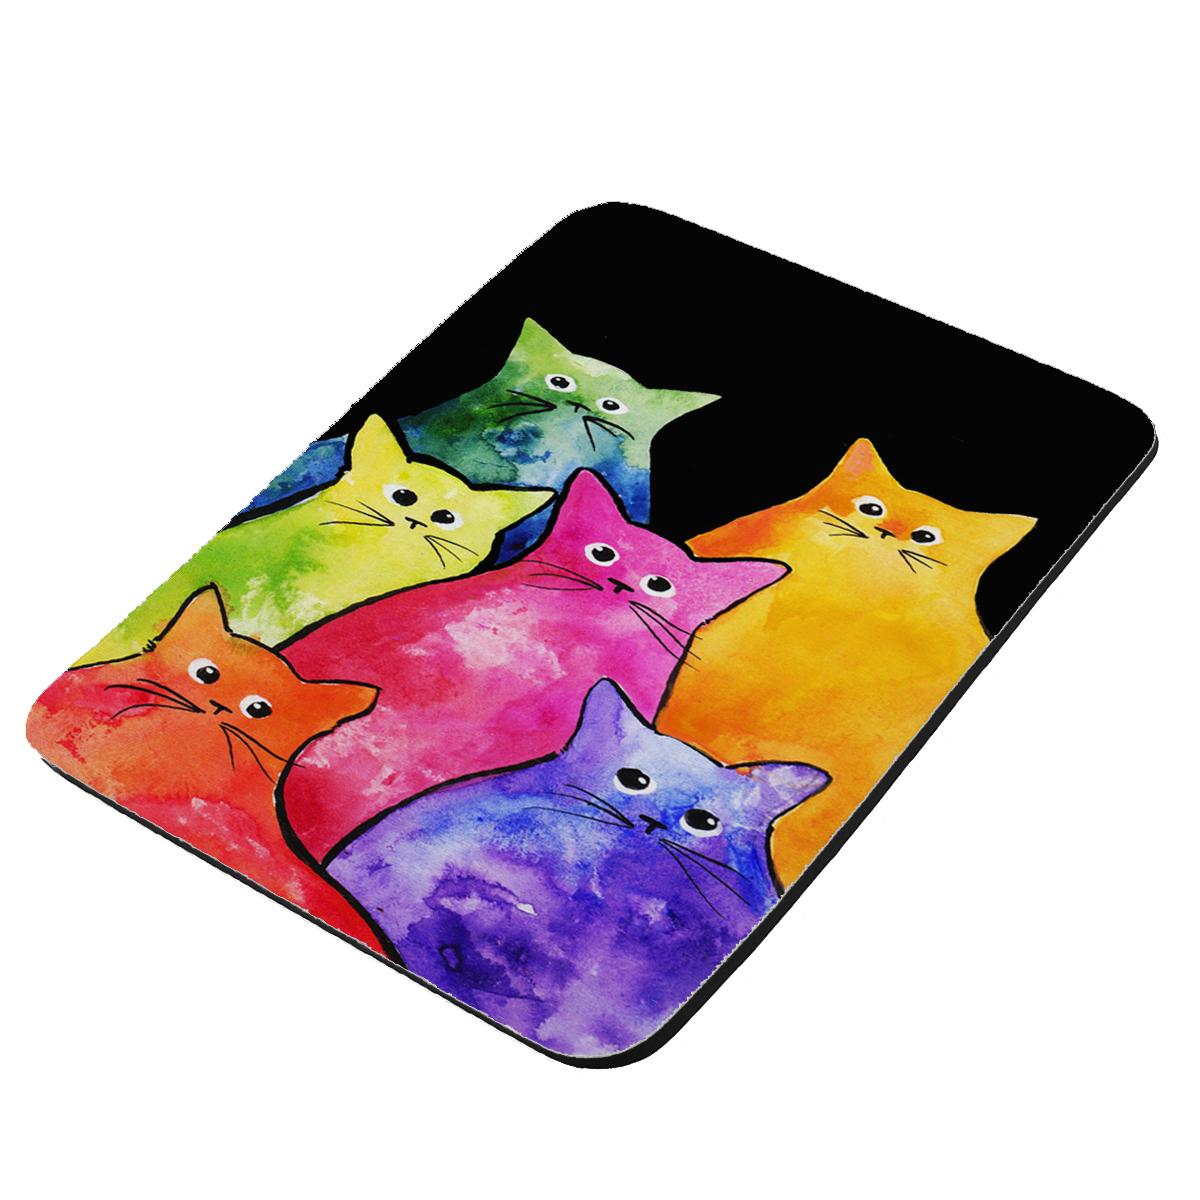 Colorful Tie-Dyed Kitties Art by Denise Every - KuzmarK Mousepad / Hot Pad / Trivet